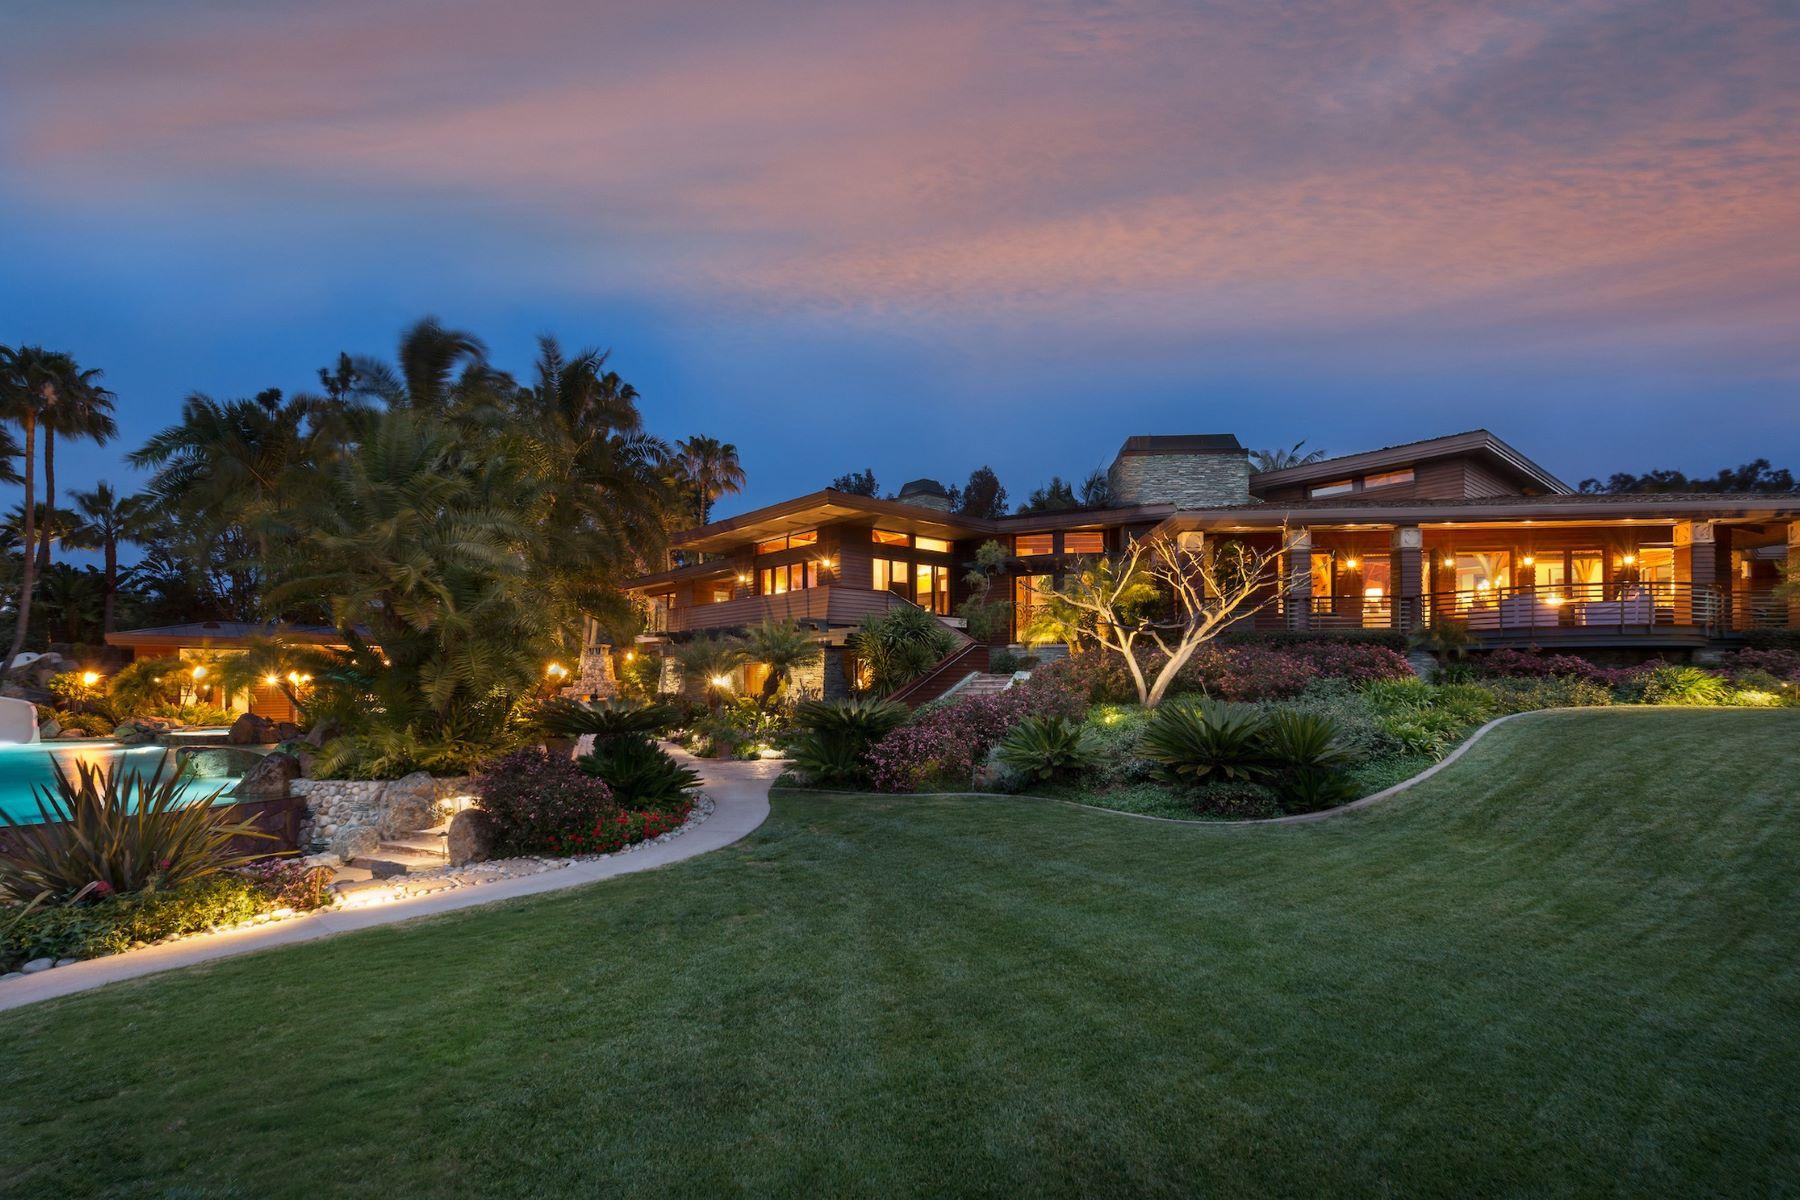 Single Family Homes for Sale at 4840 El Secreto Rancho Santa Fe, California 92067 United States